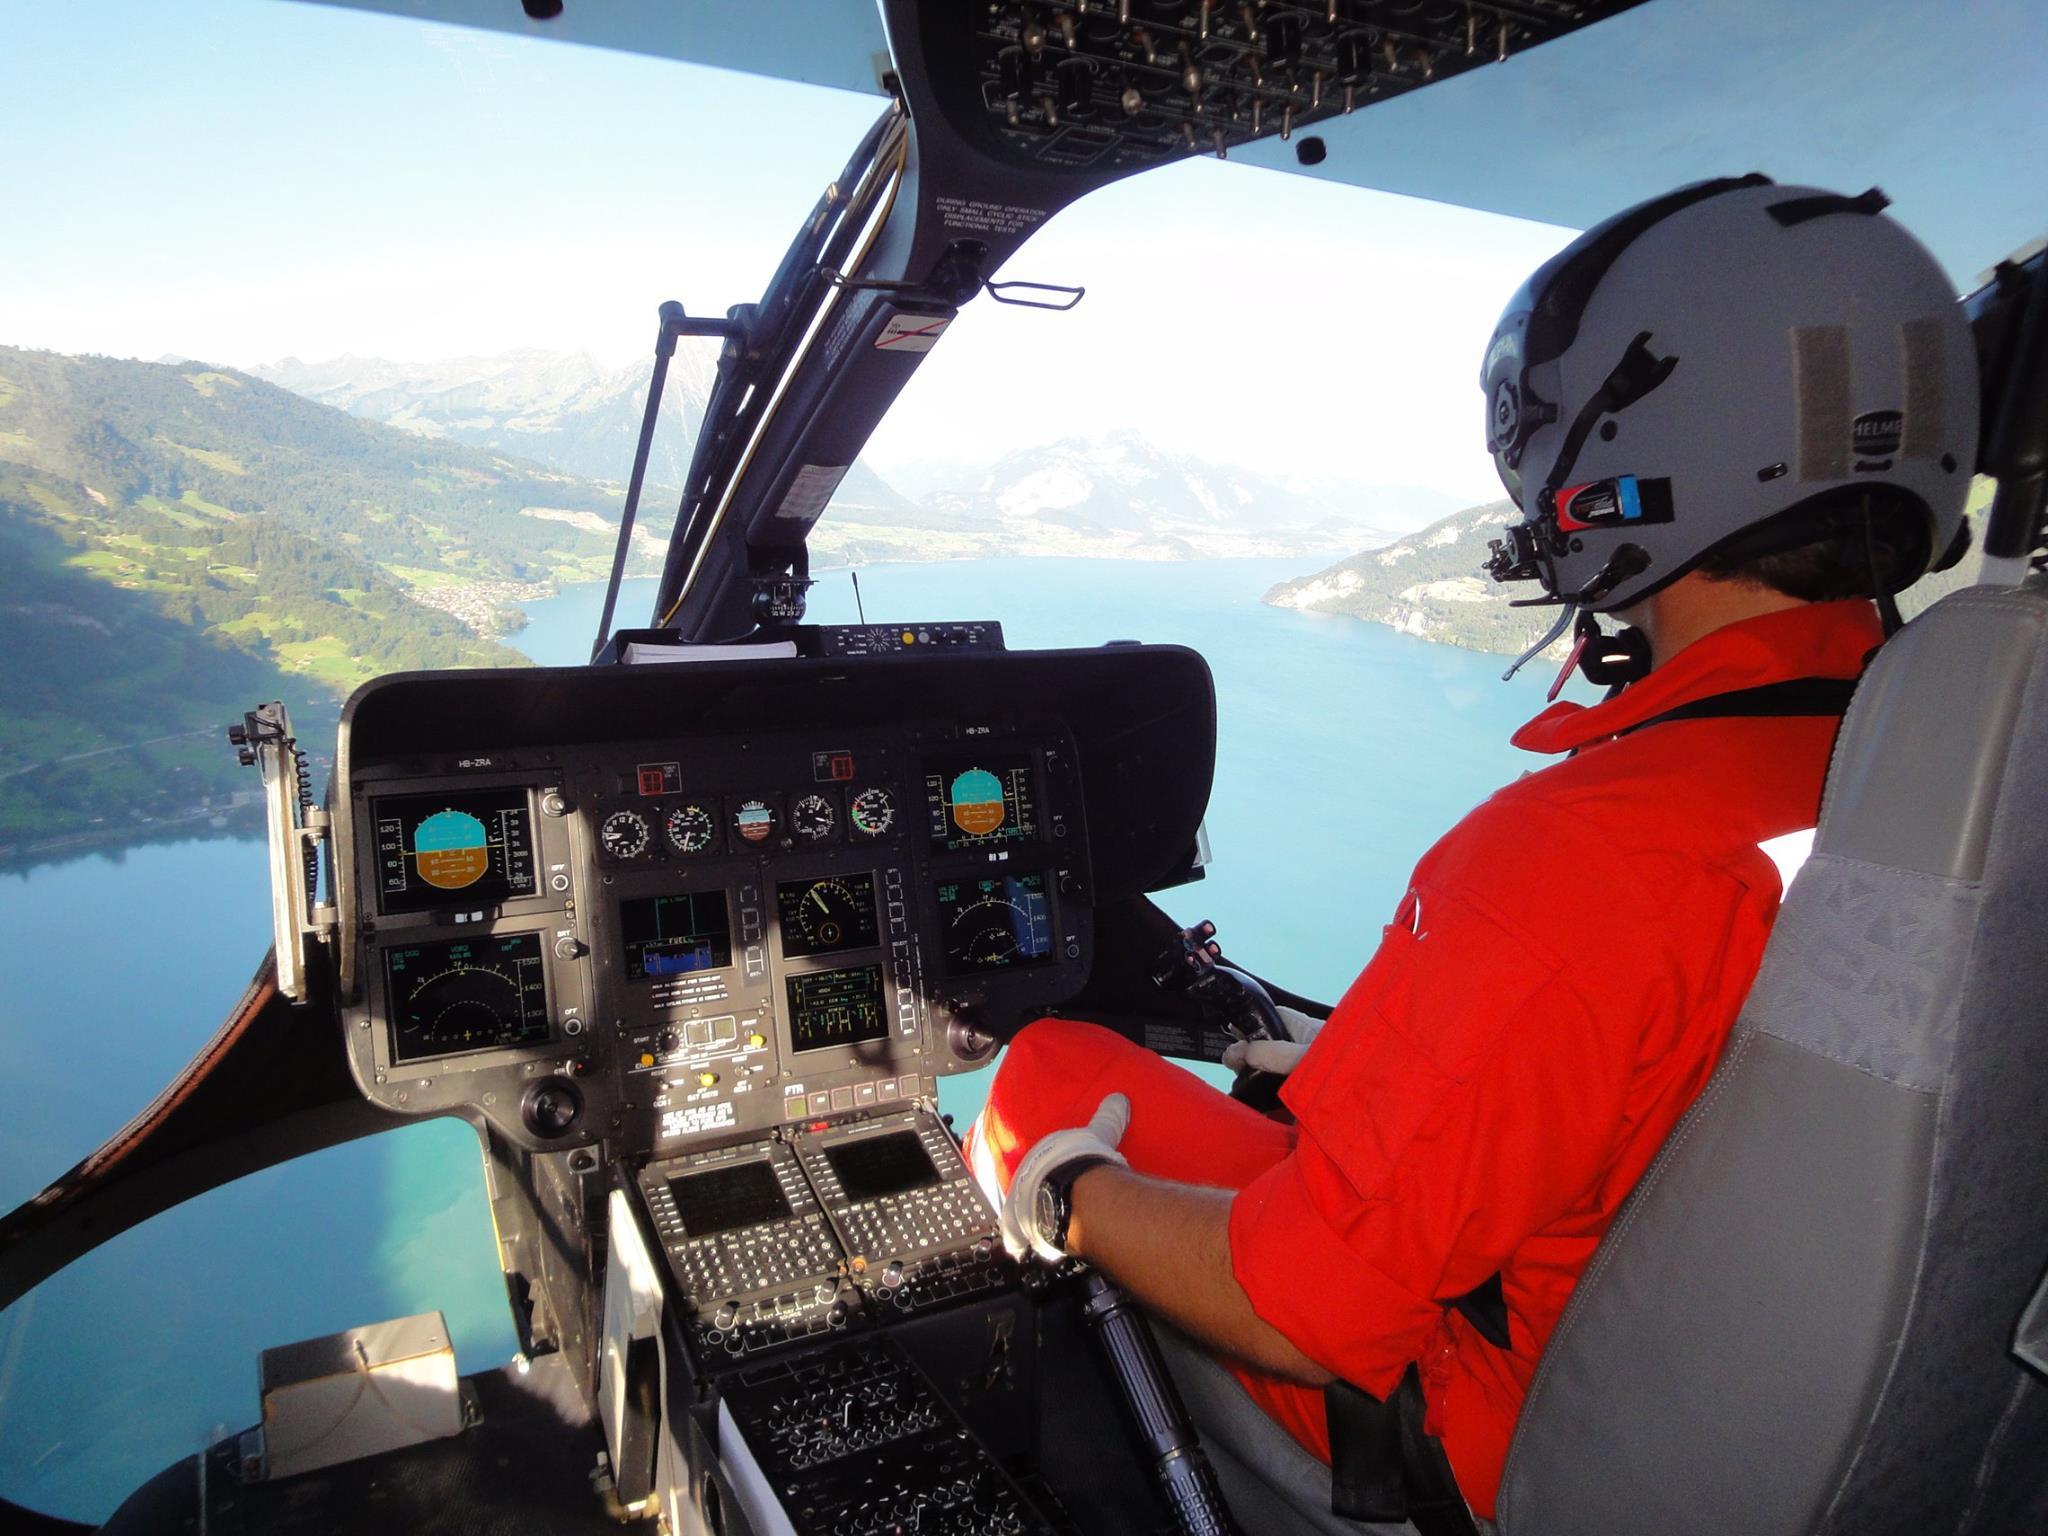 Rega helicopter